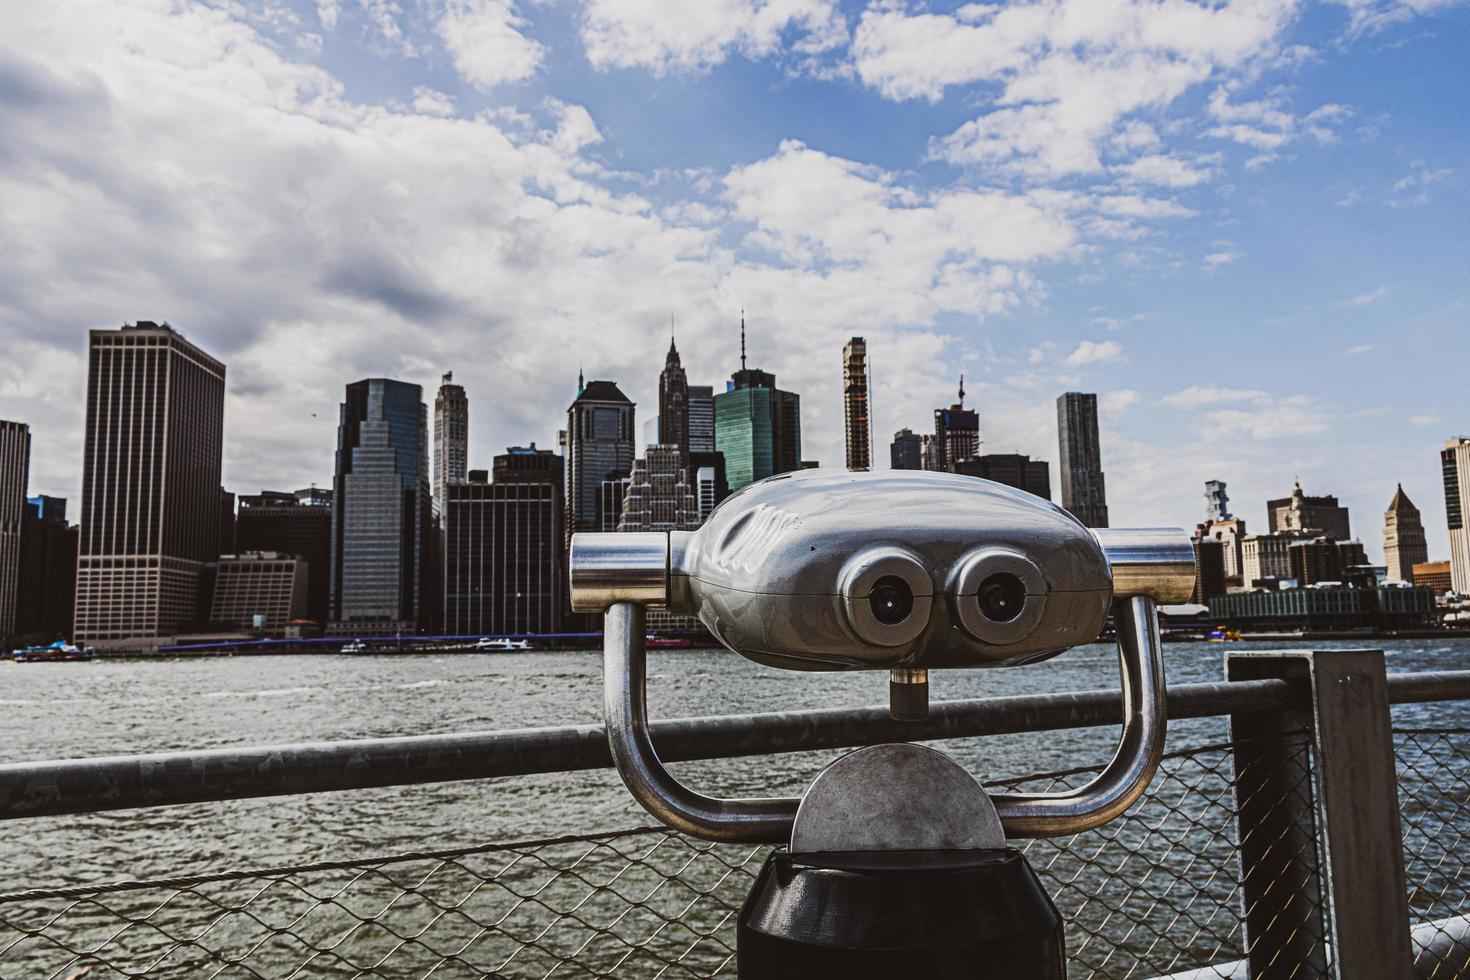 City tower viewer photo